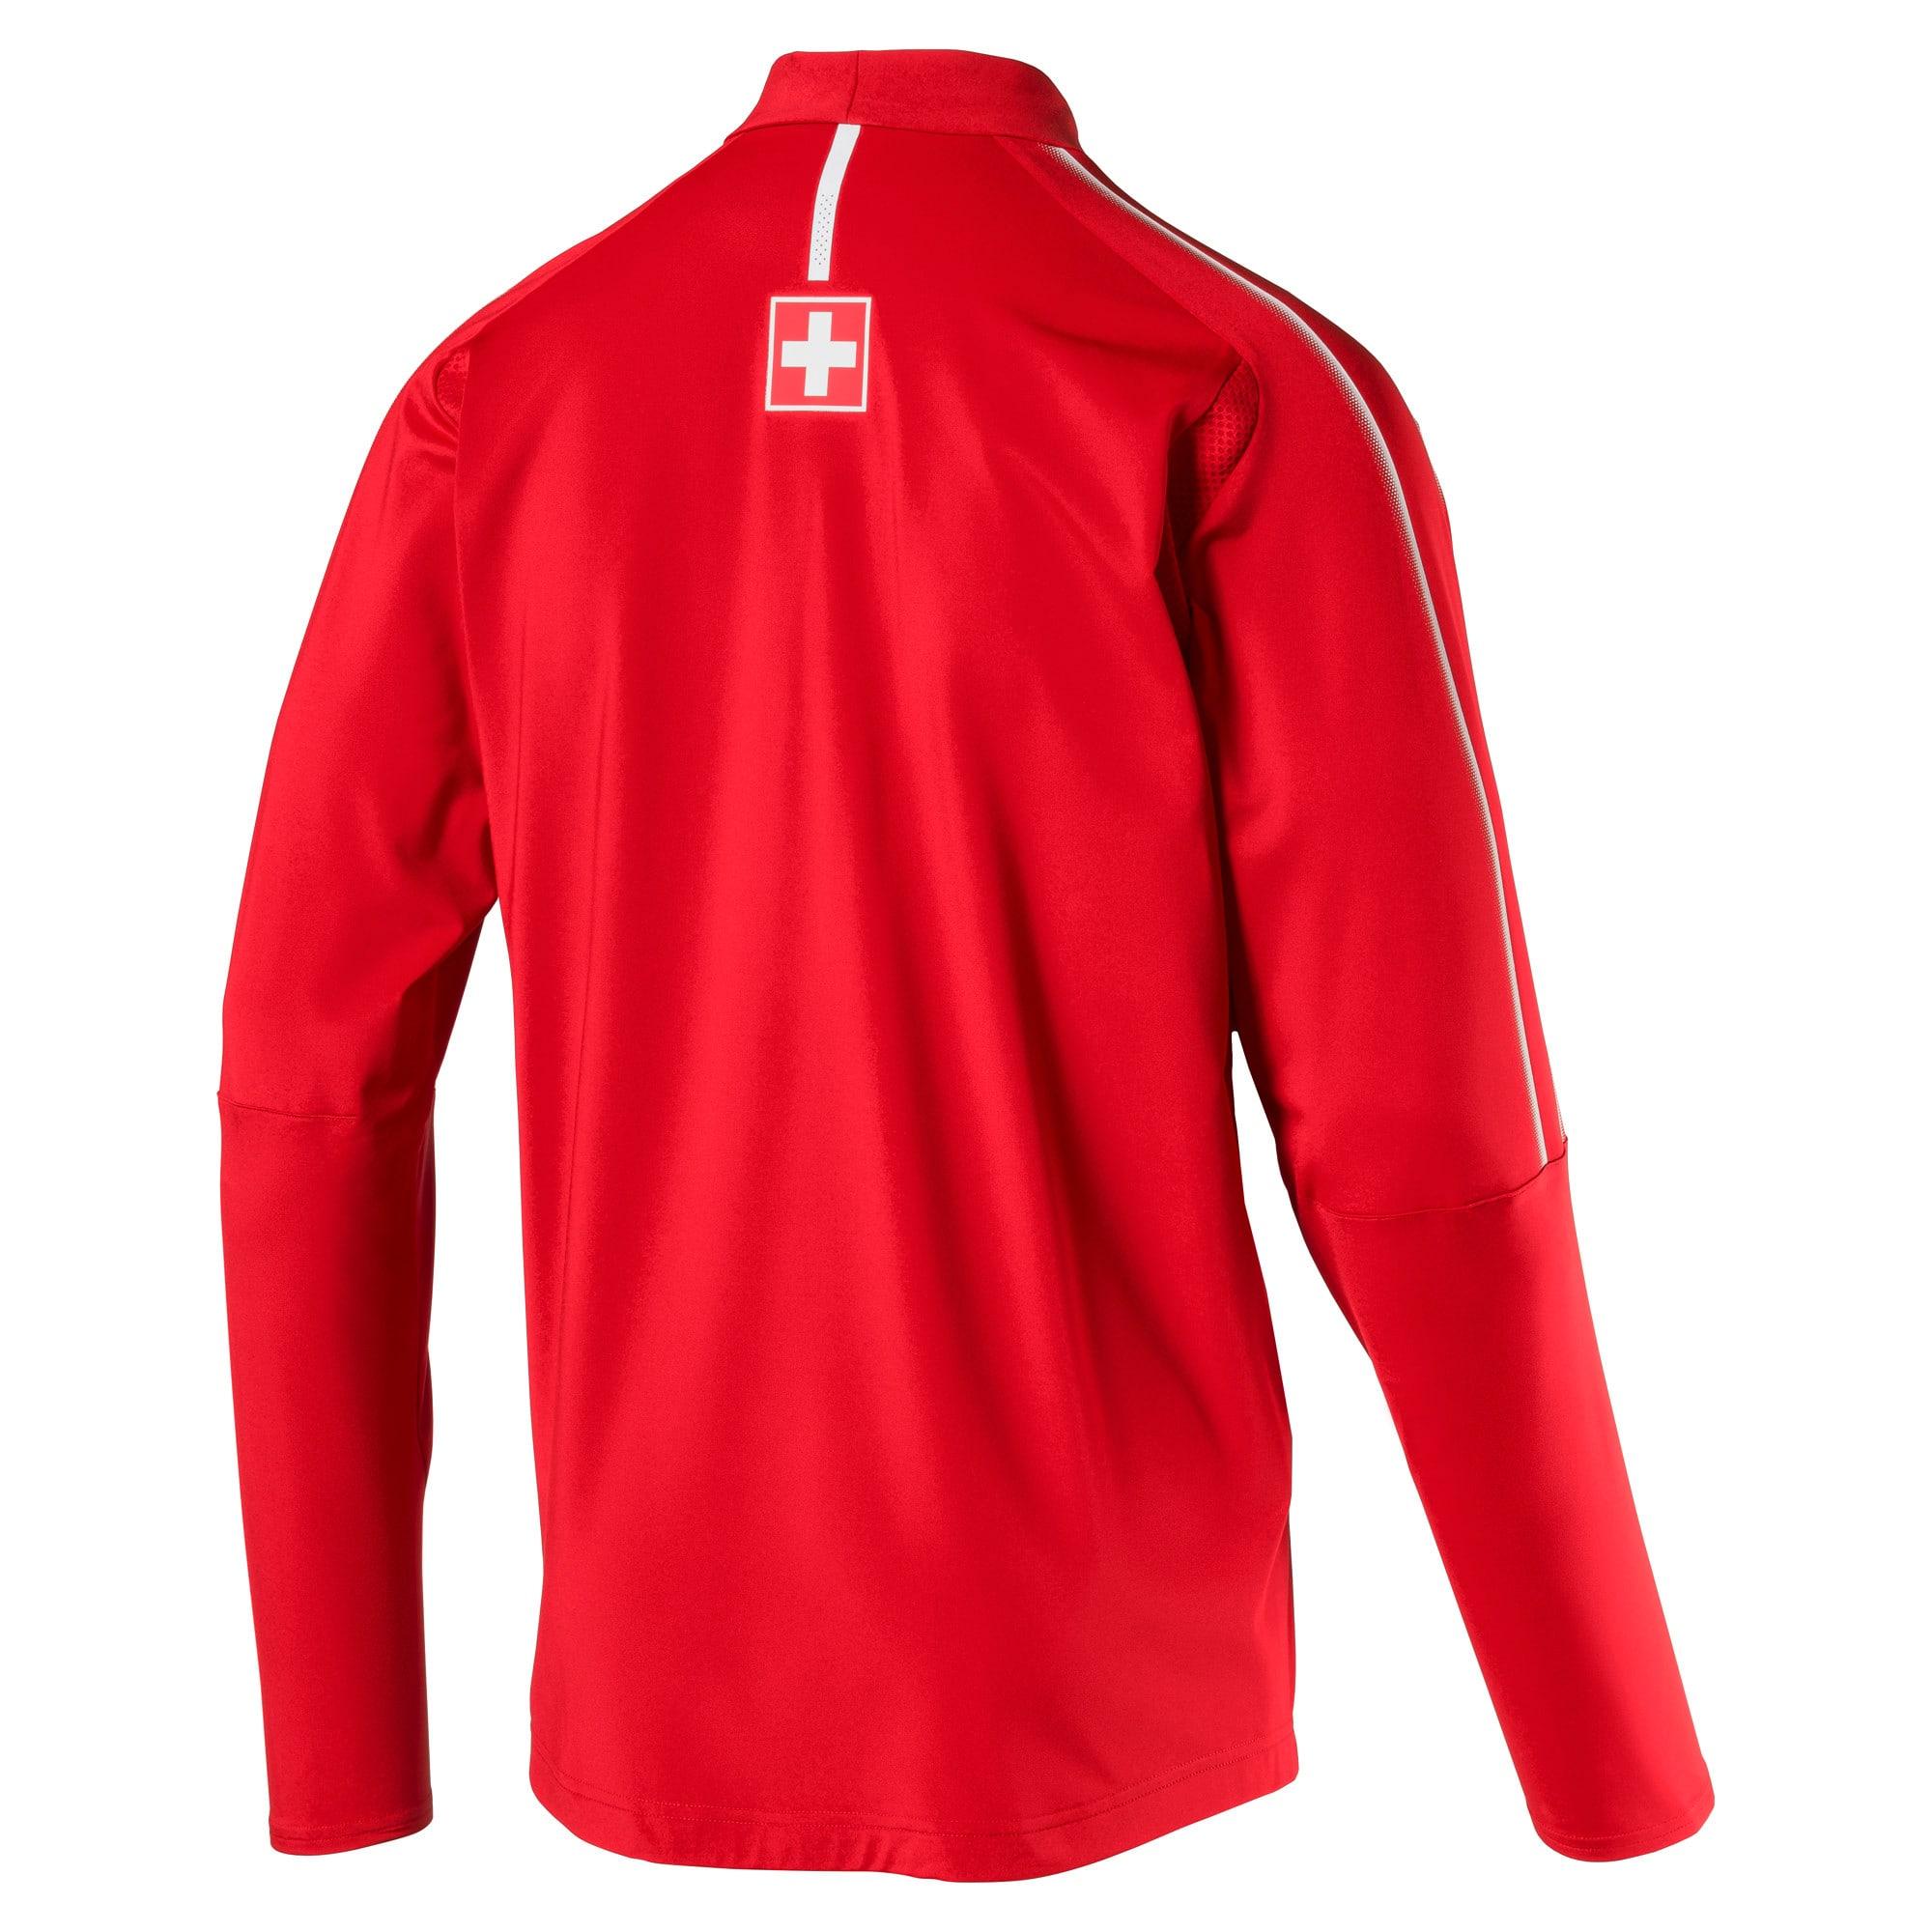 Thumbnail 4 of Trainingstop van Zwitserland met korte rits, Puma Red-Puma White, medium